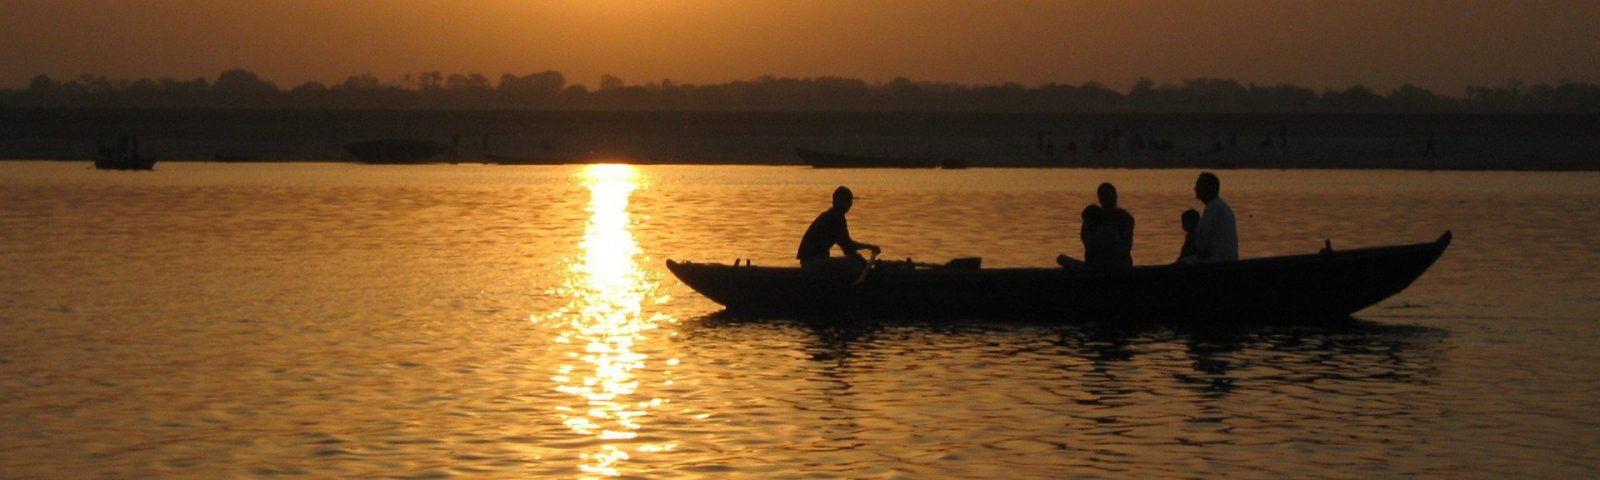 Conscious Journeys Turismo Sostenibile e Responsabile